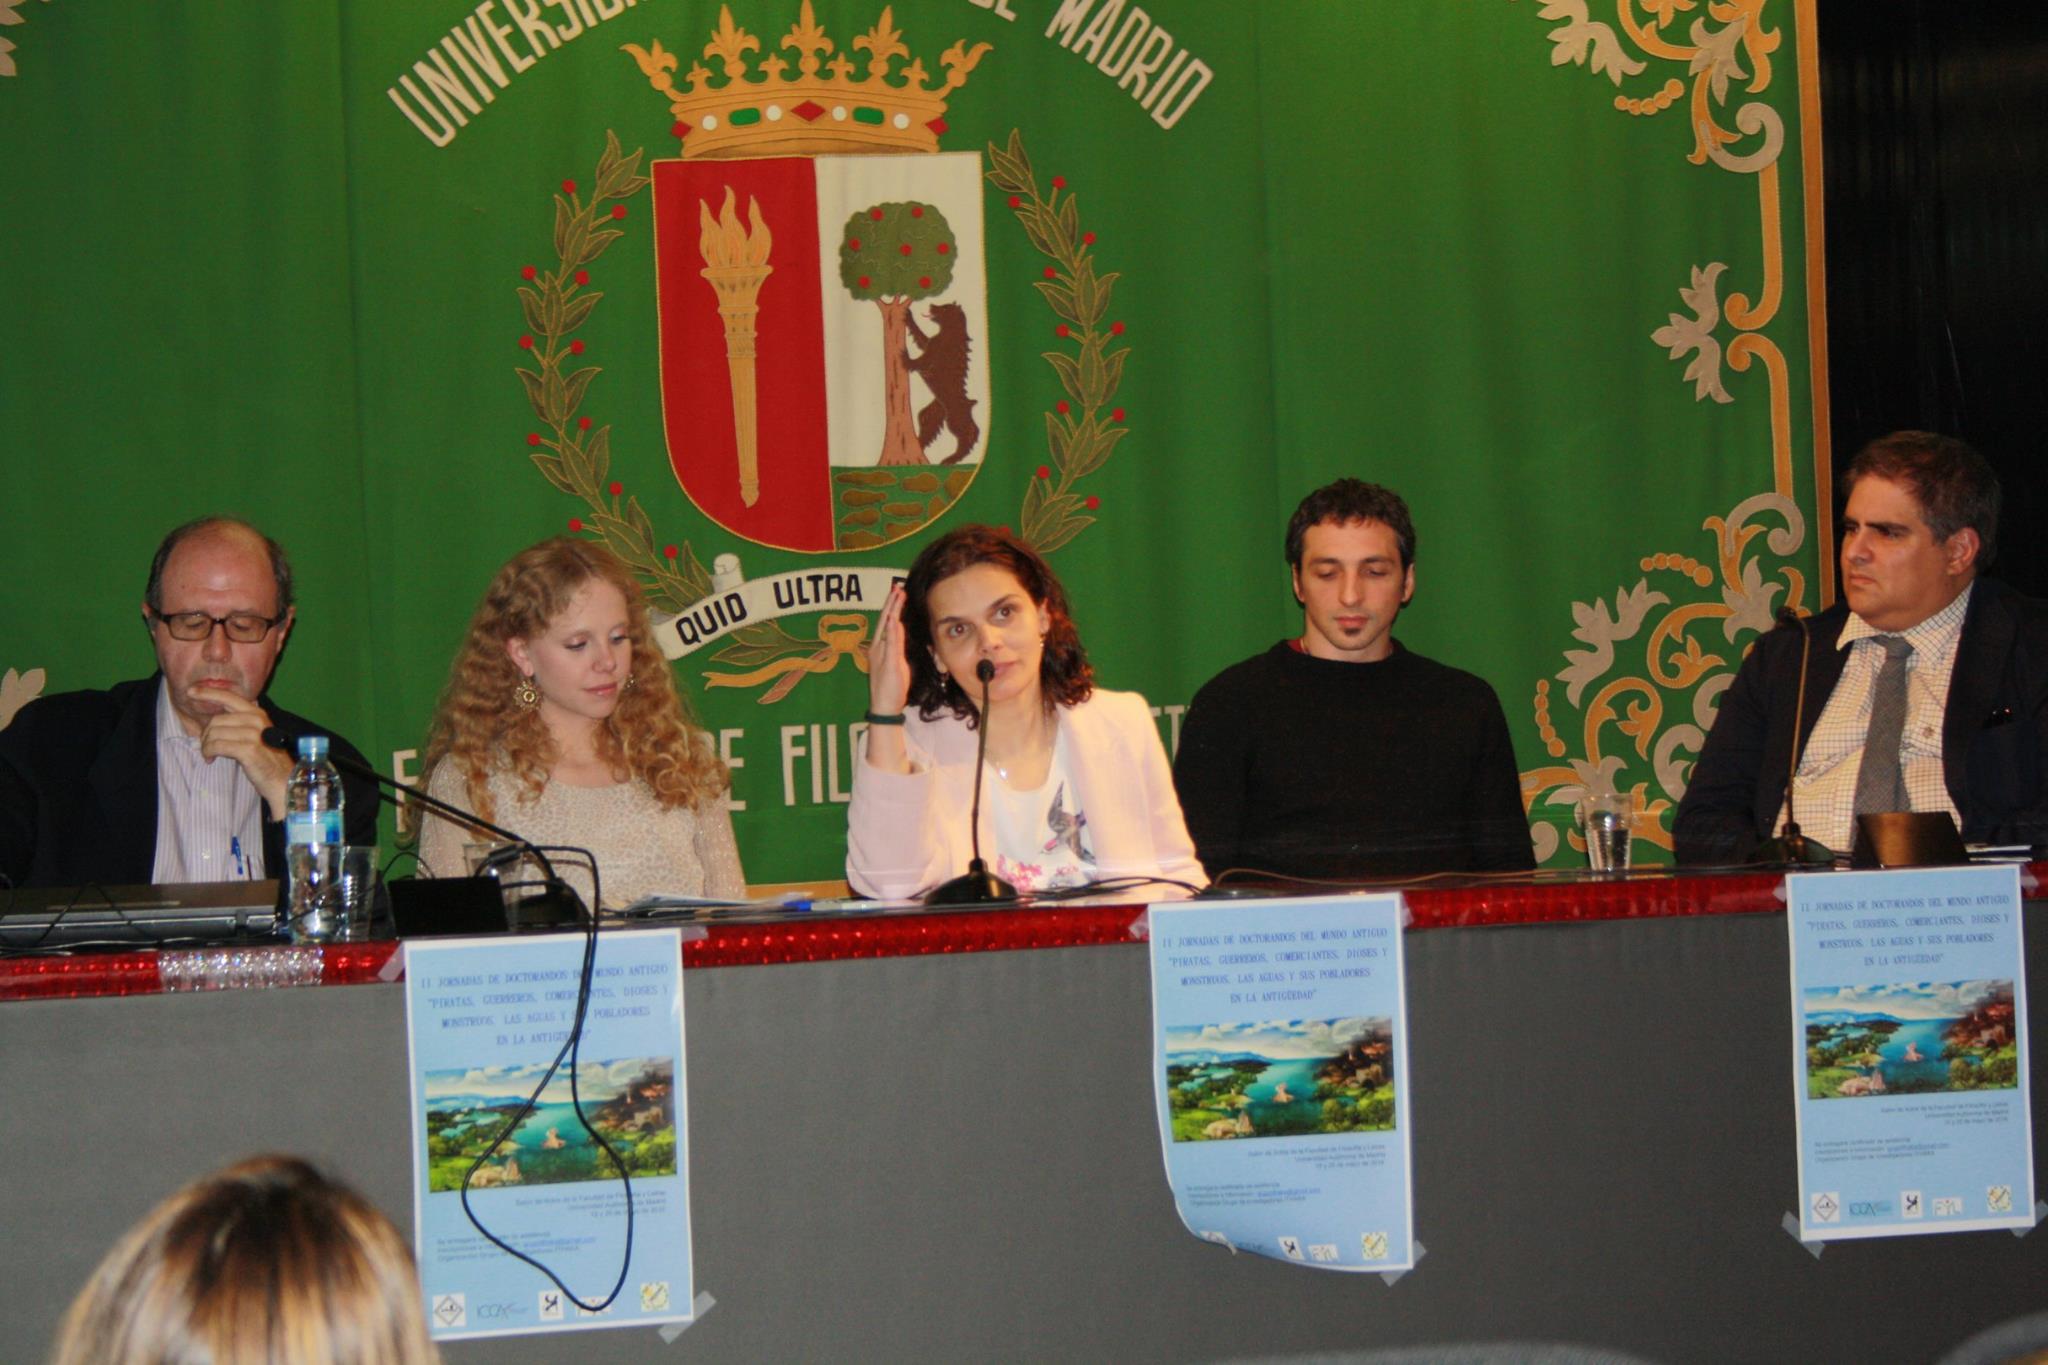 Adolfo Domínguez, Cristina Muñoz-Delgado, María del Mar Gabaldón, Santiago González e Hipólito Sánchiz (Fotografía de Marta Marchena)